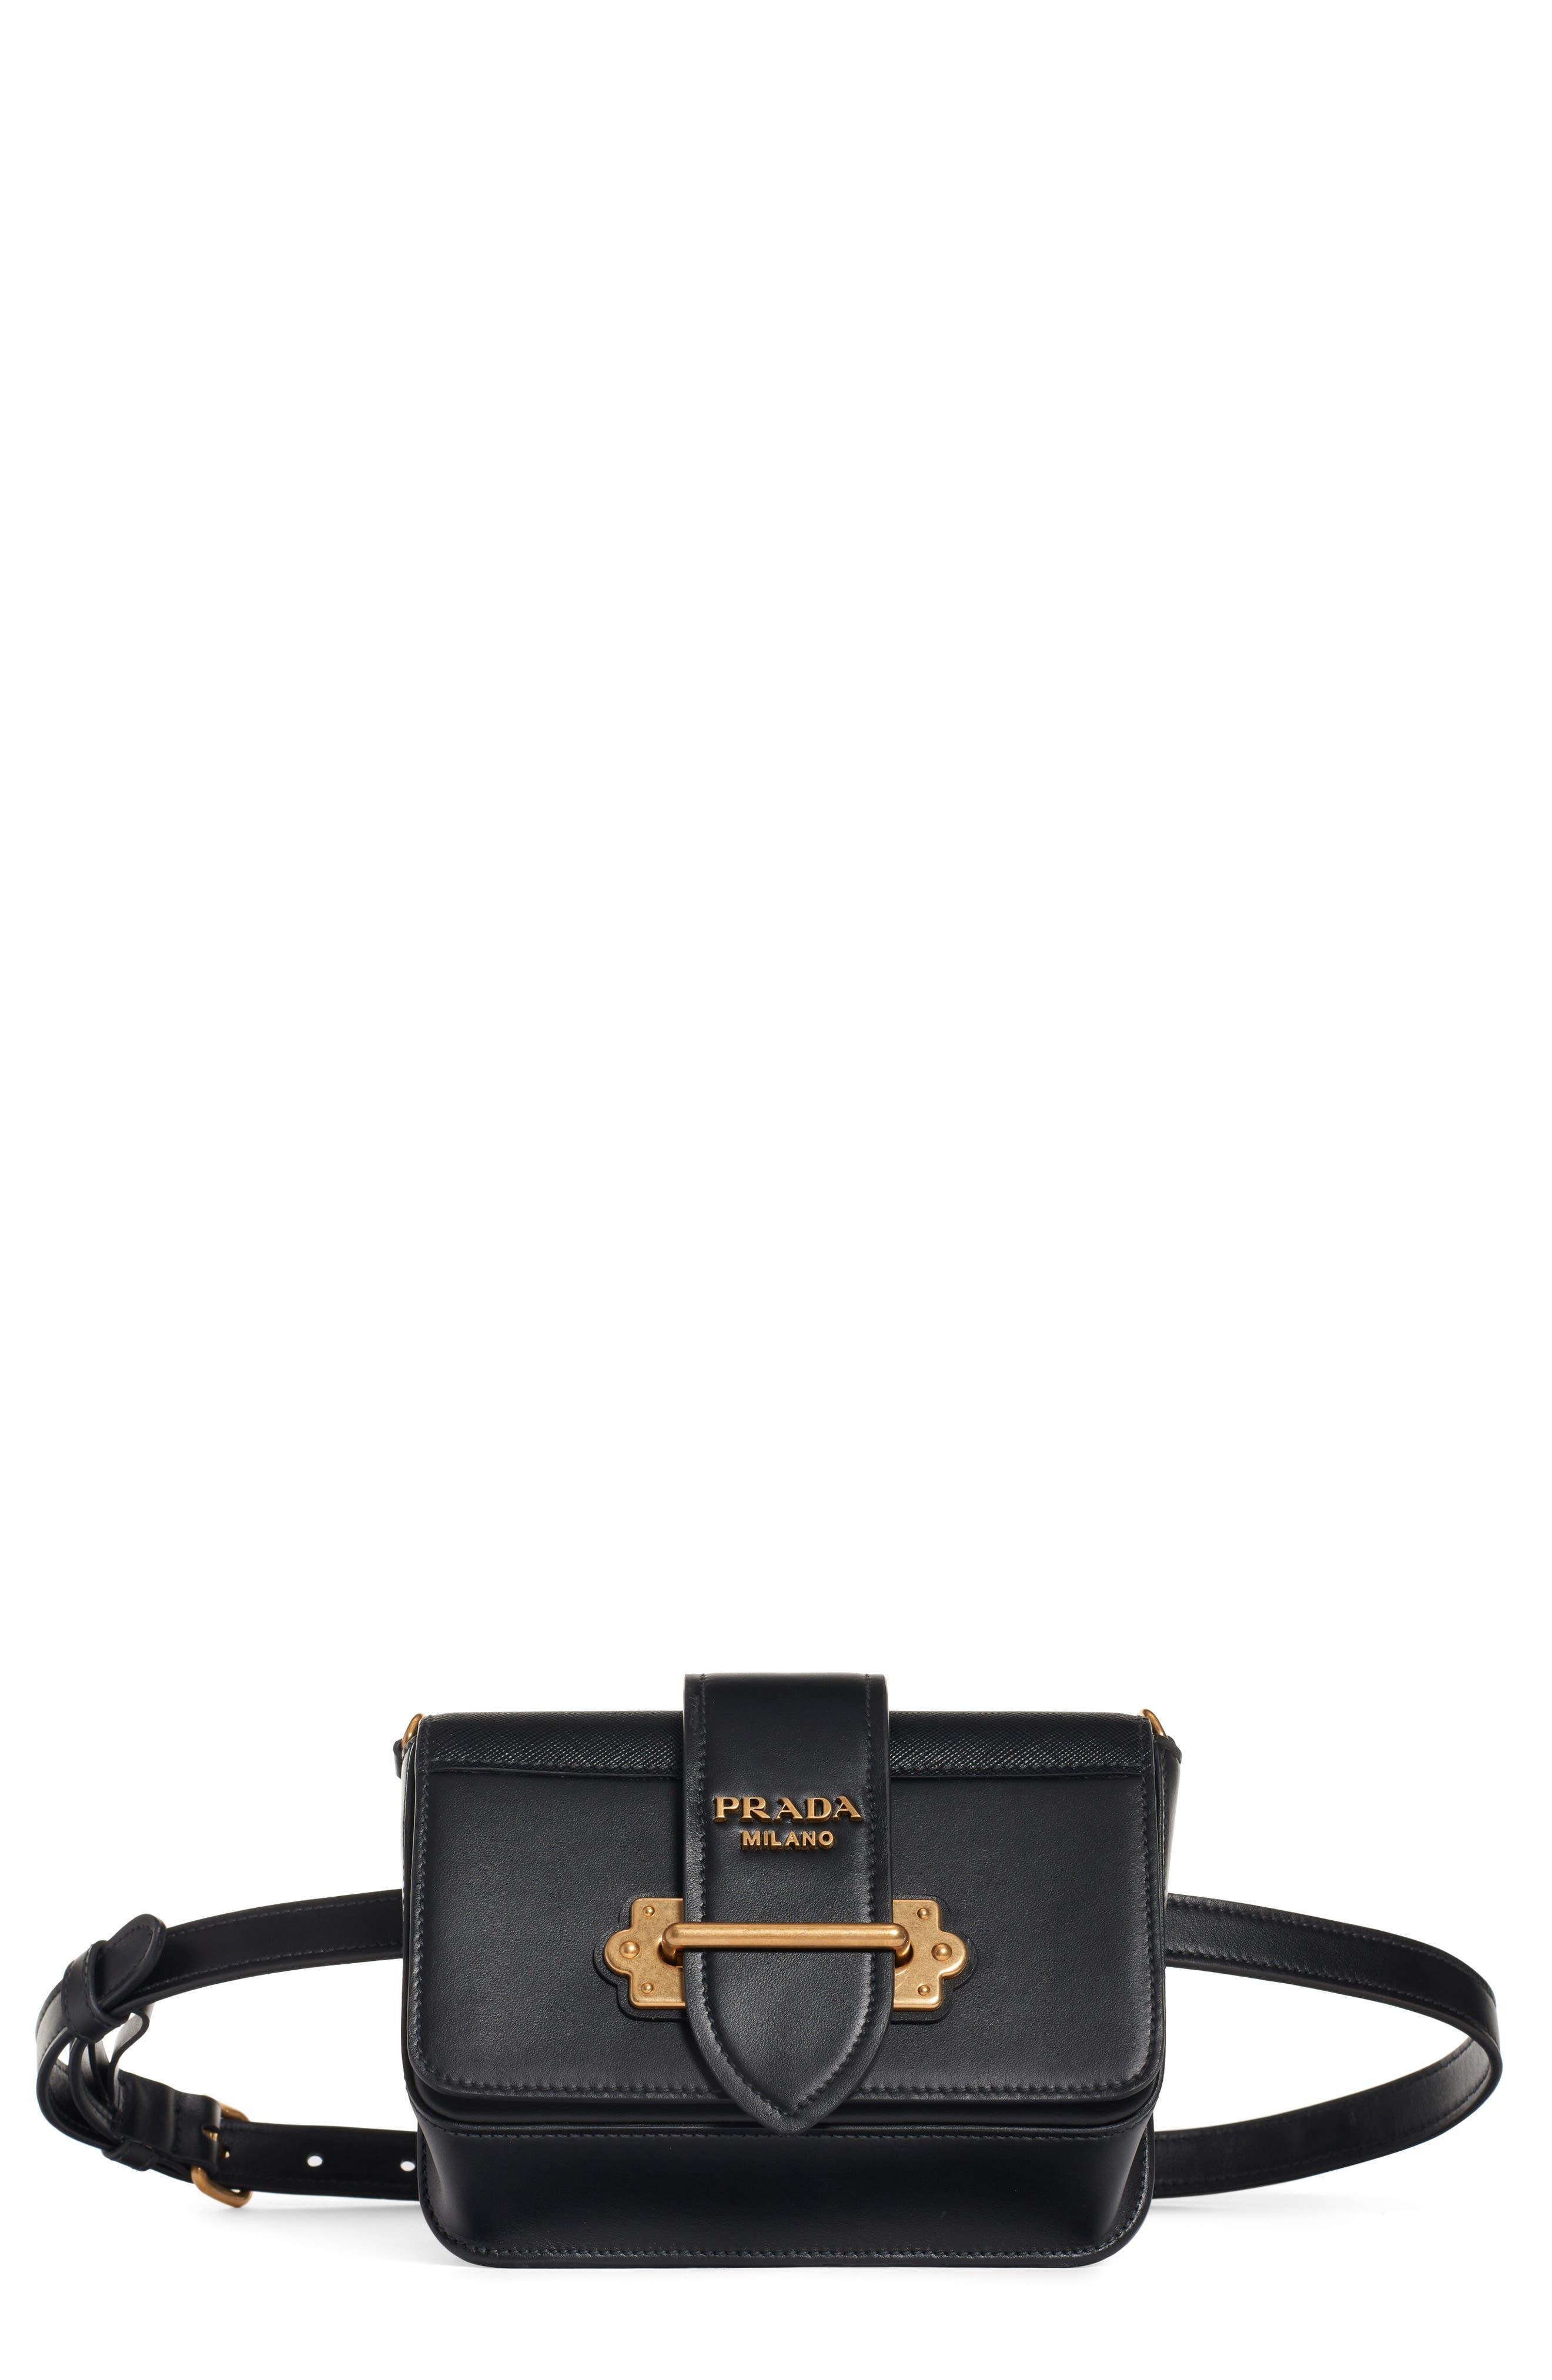 c0c2bc55f214 greece prada black nylon belt bag d50d6 82476; coupon prada cahier leather belt  bag 34220 0d658